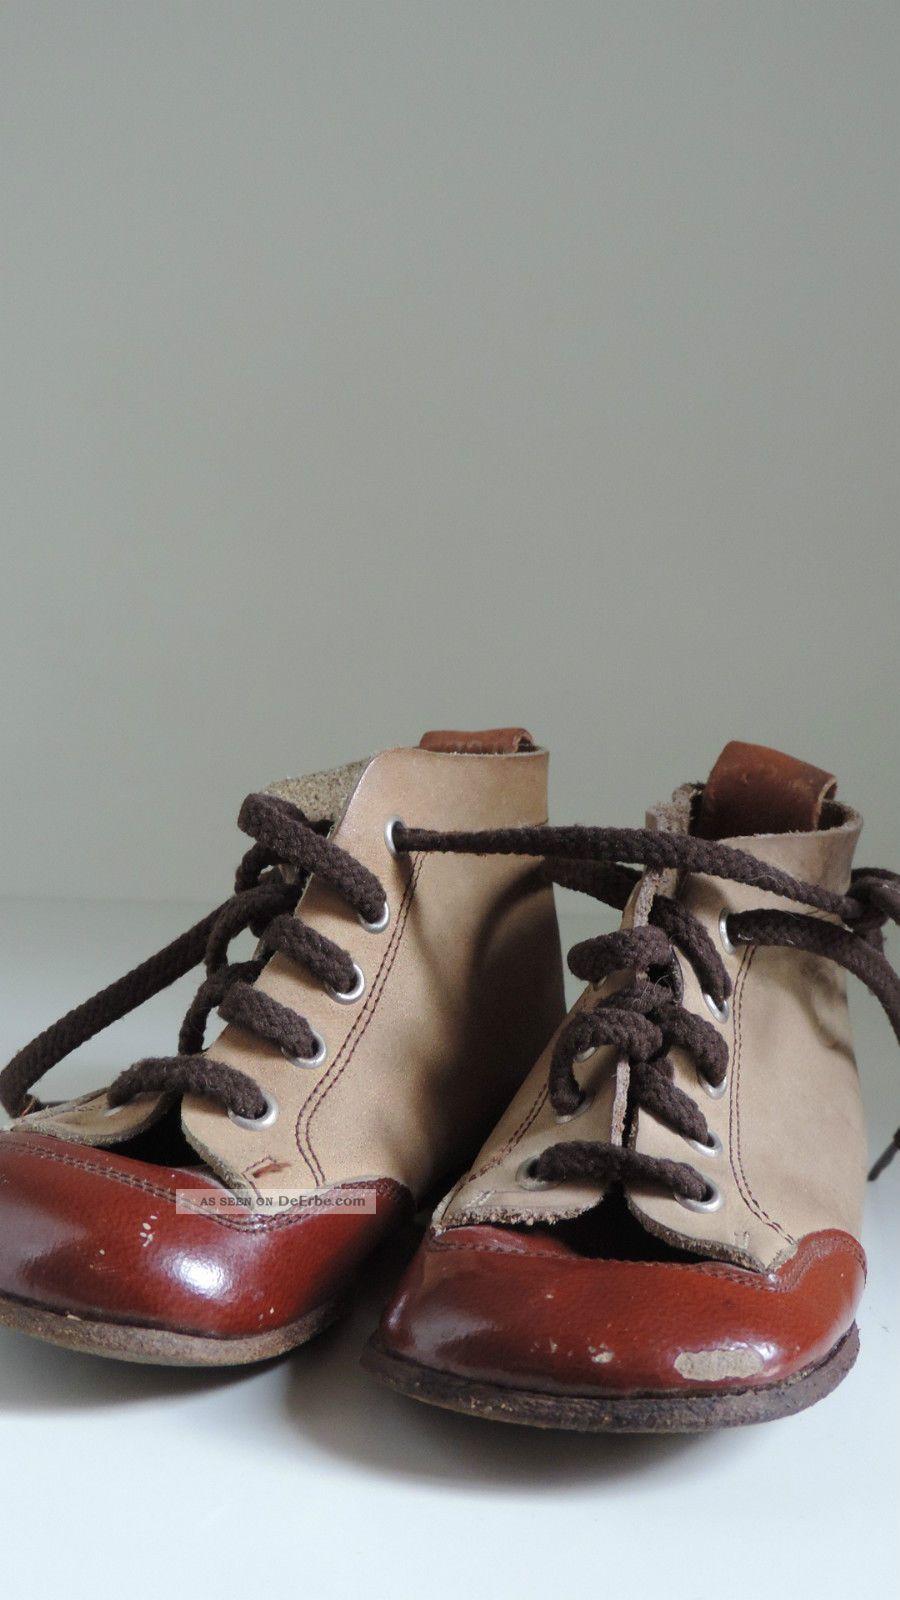 premium selection 96b2c b59ec Salamander, Lurchi, Schuhe, Kinder - O. Puppenschuhe, Leder ...